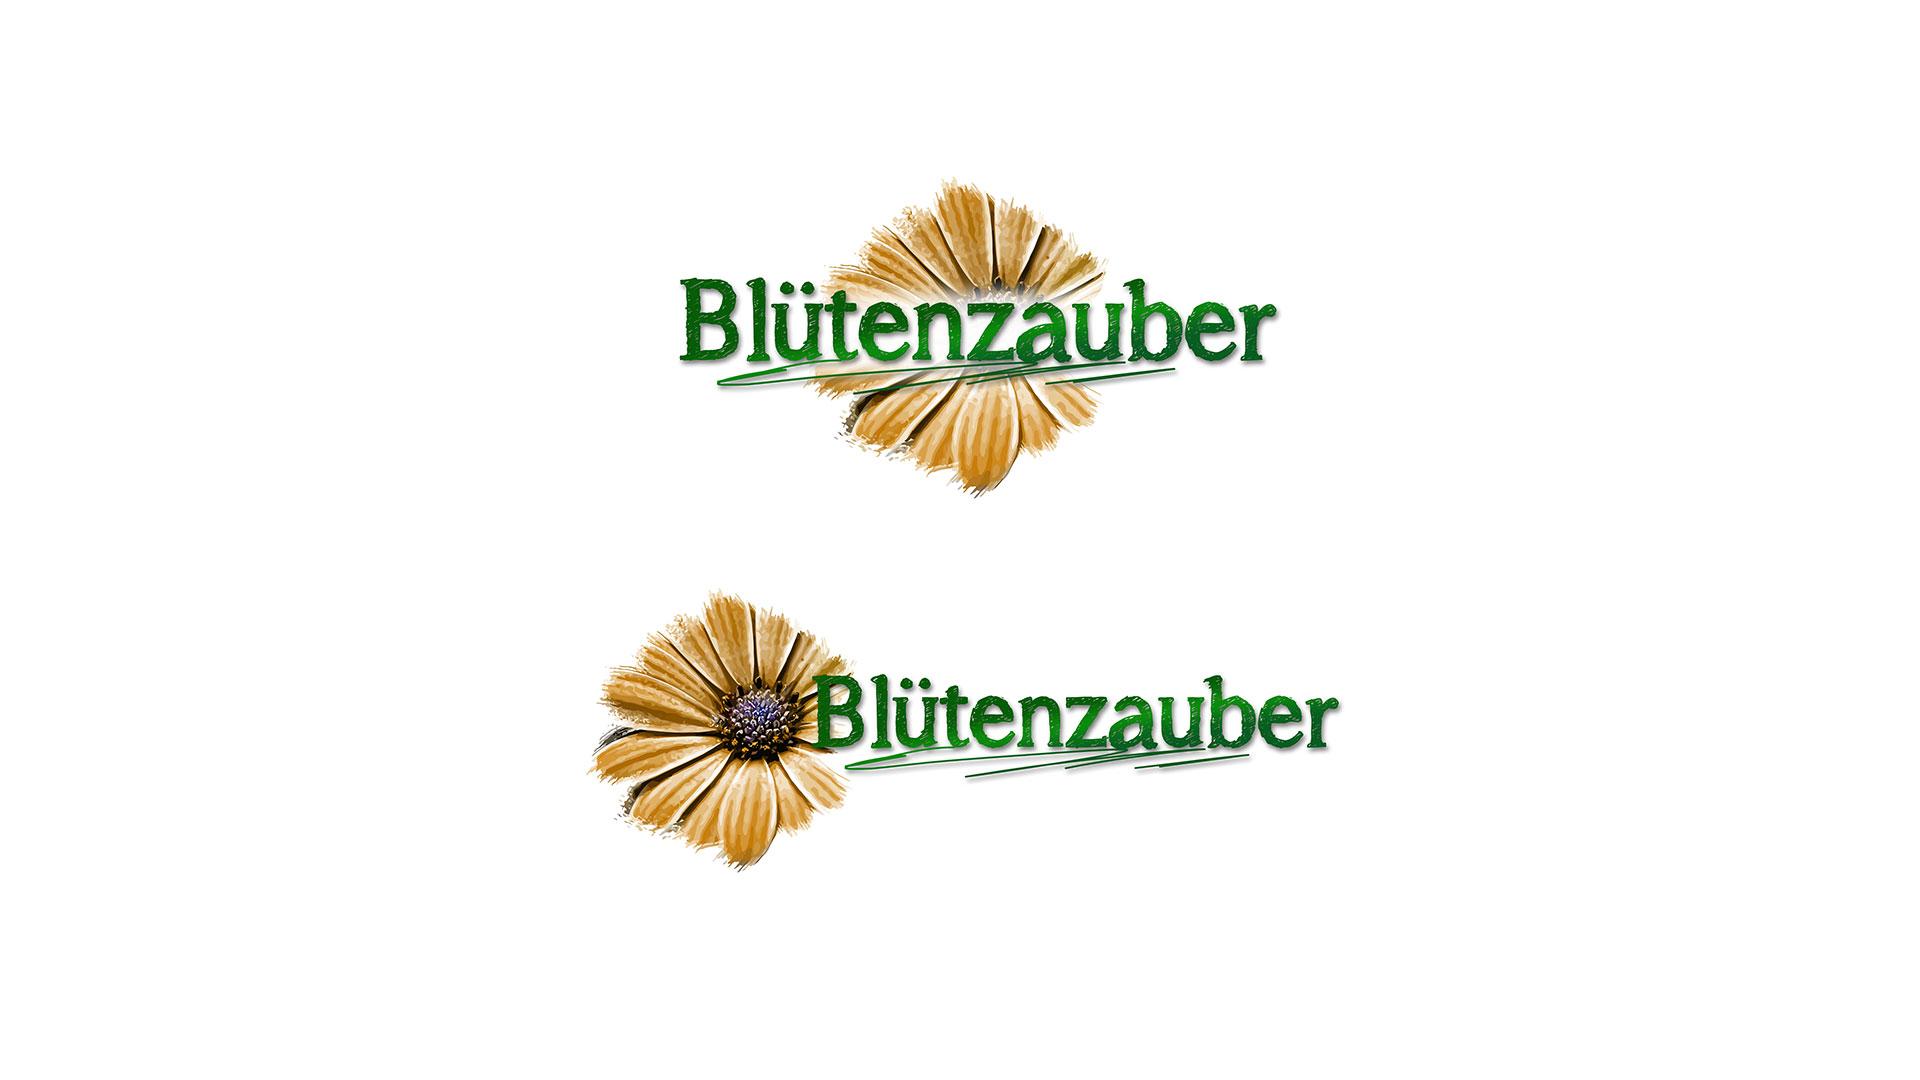 bluetenzauber-logo